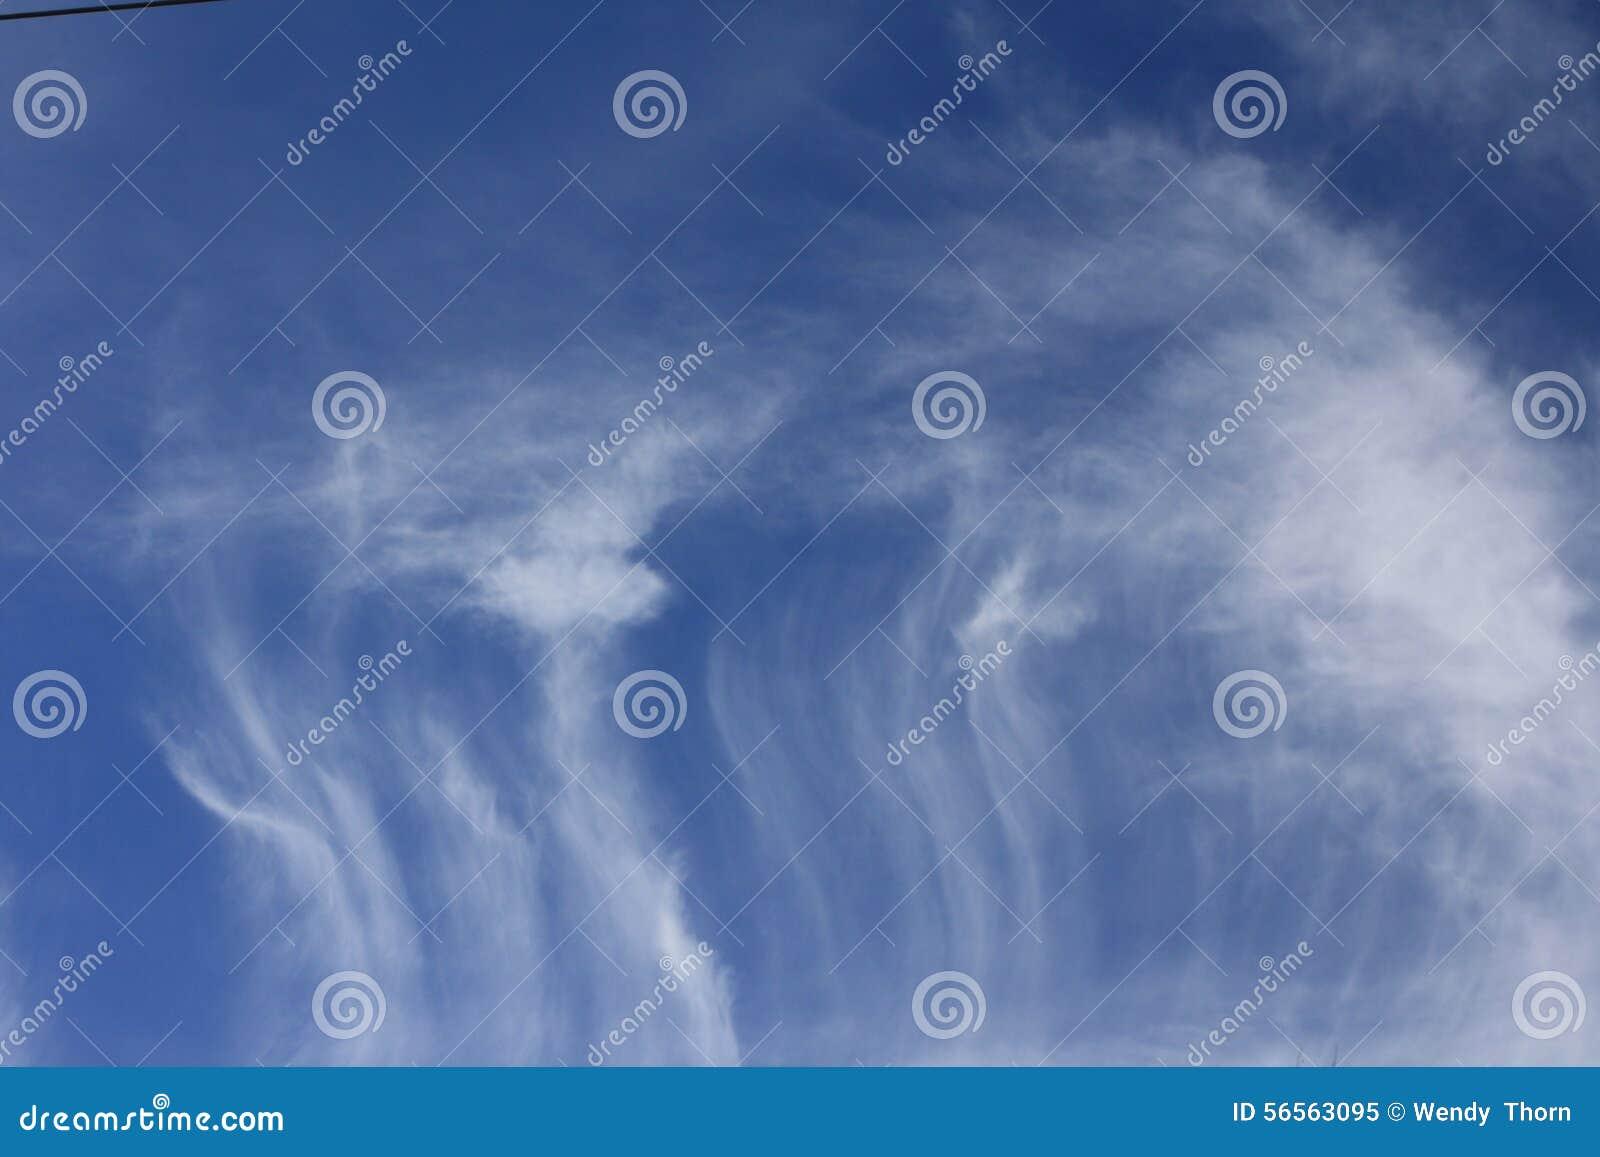 Download Το Whispy καλύπτει το σκούρο μπλε υπόβαθρο ουρανού Στοκ Εικόνα - εικόνα από ουρανός, ειρήνη: 56563095